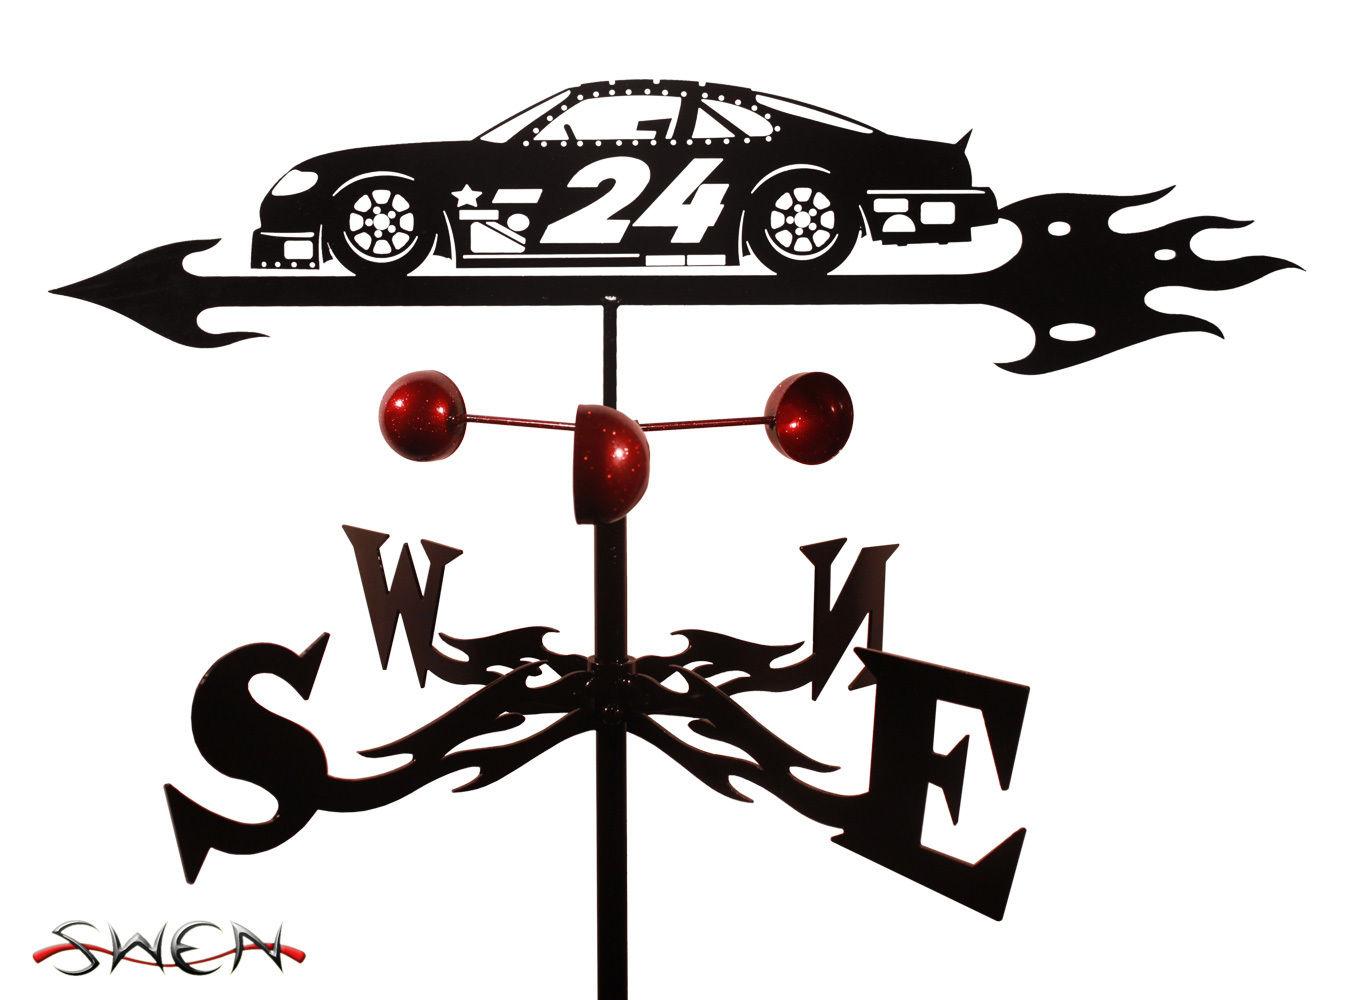 SWEN Products Farrell Series NASCAR STOCK CAR #24 Steel Weathervane